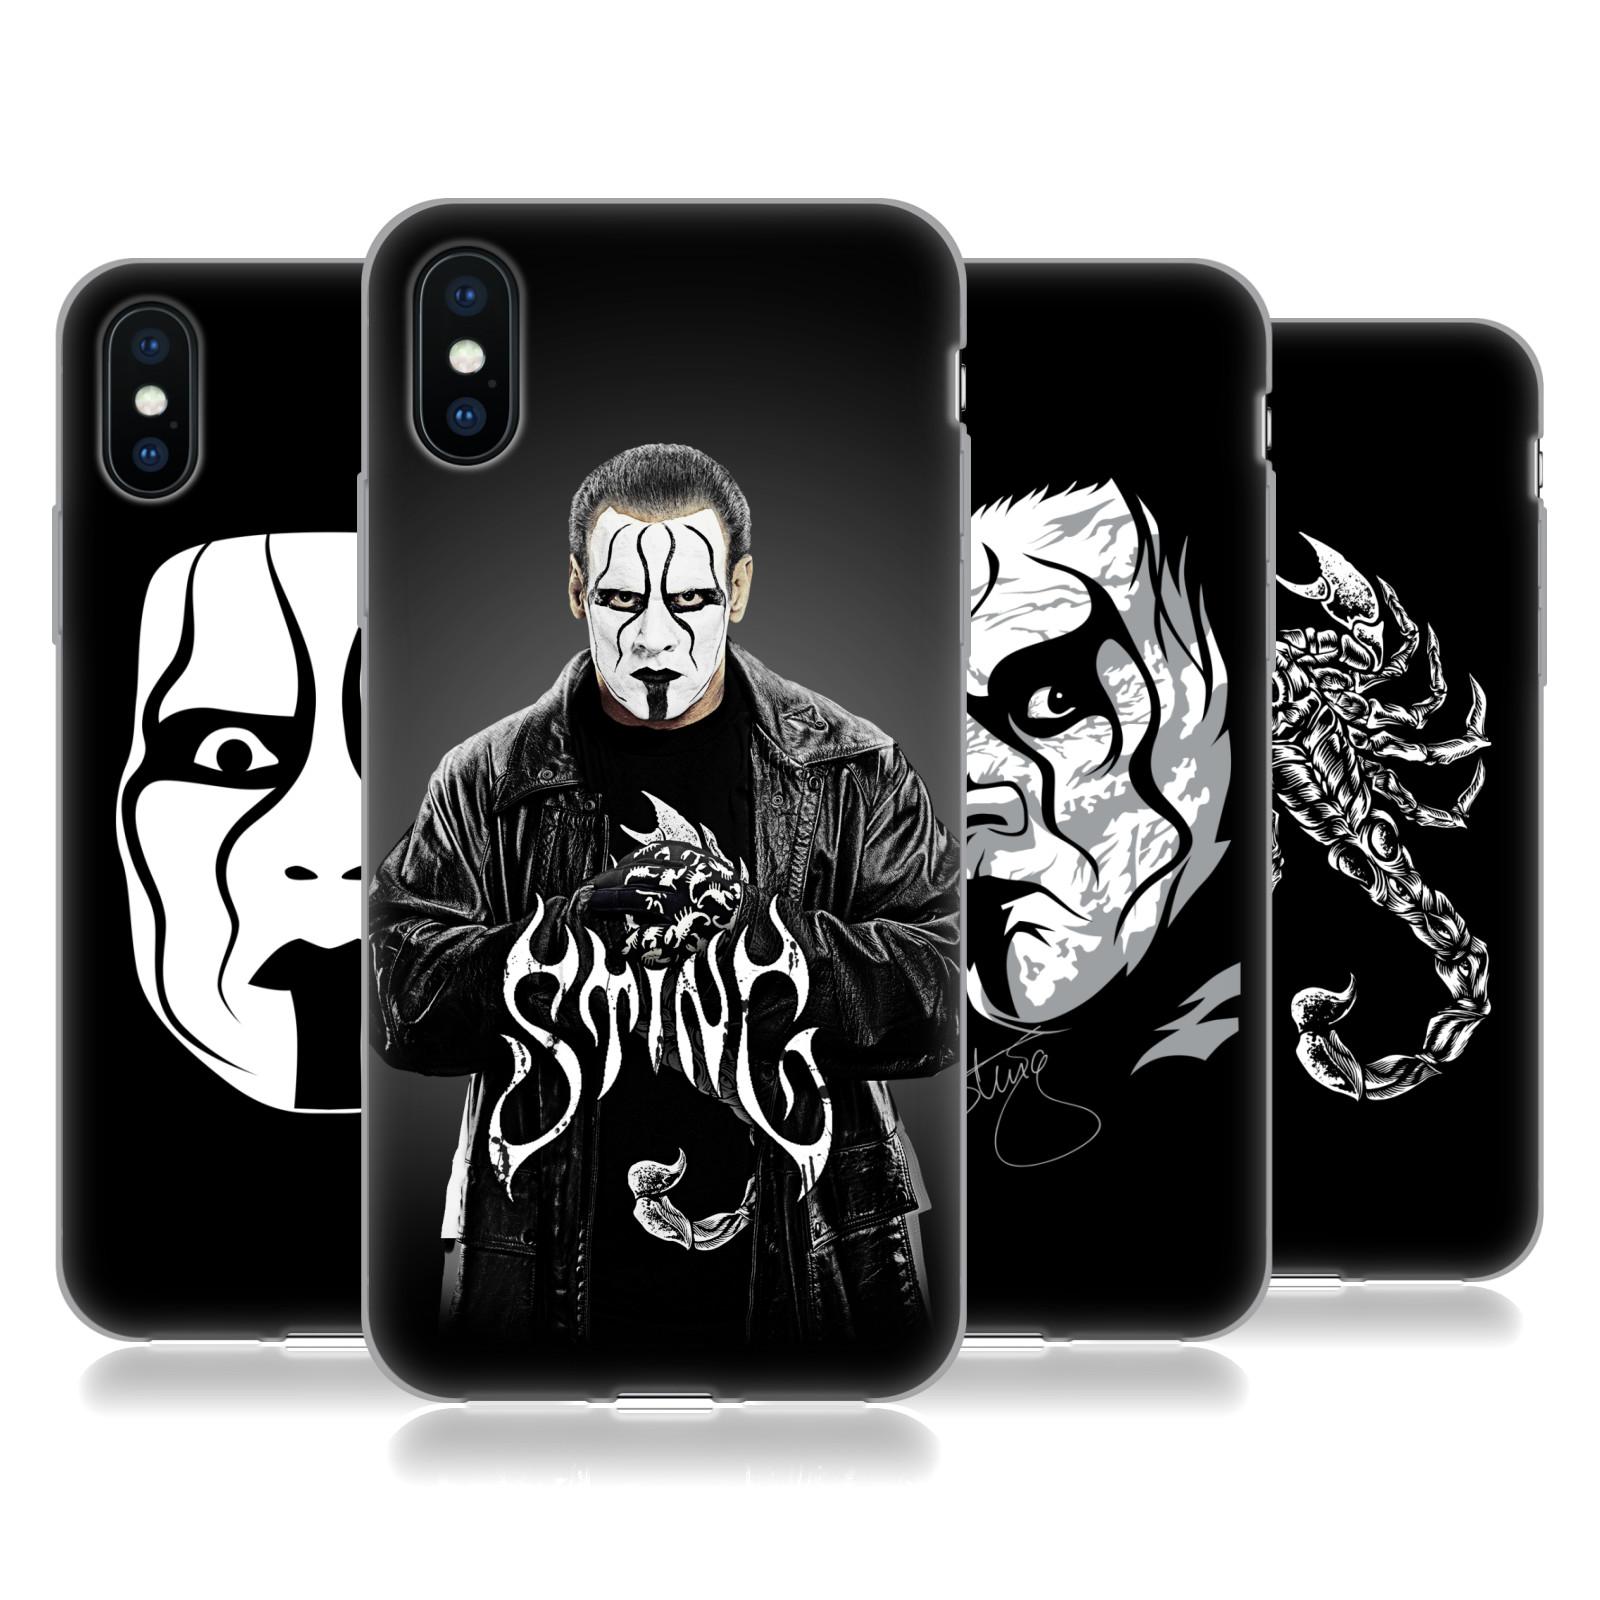 WWE <!--translate-lineup-->Sting<!--translate-lineup-->